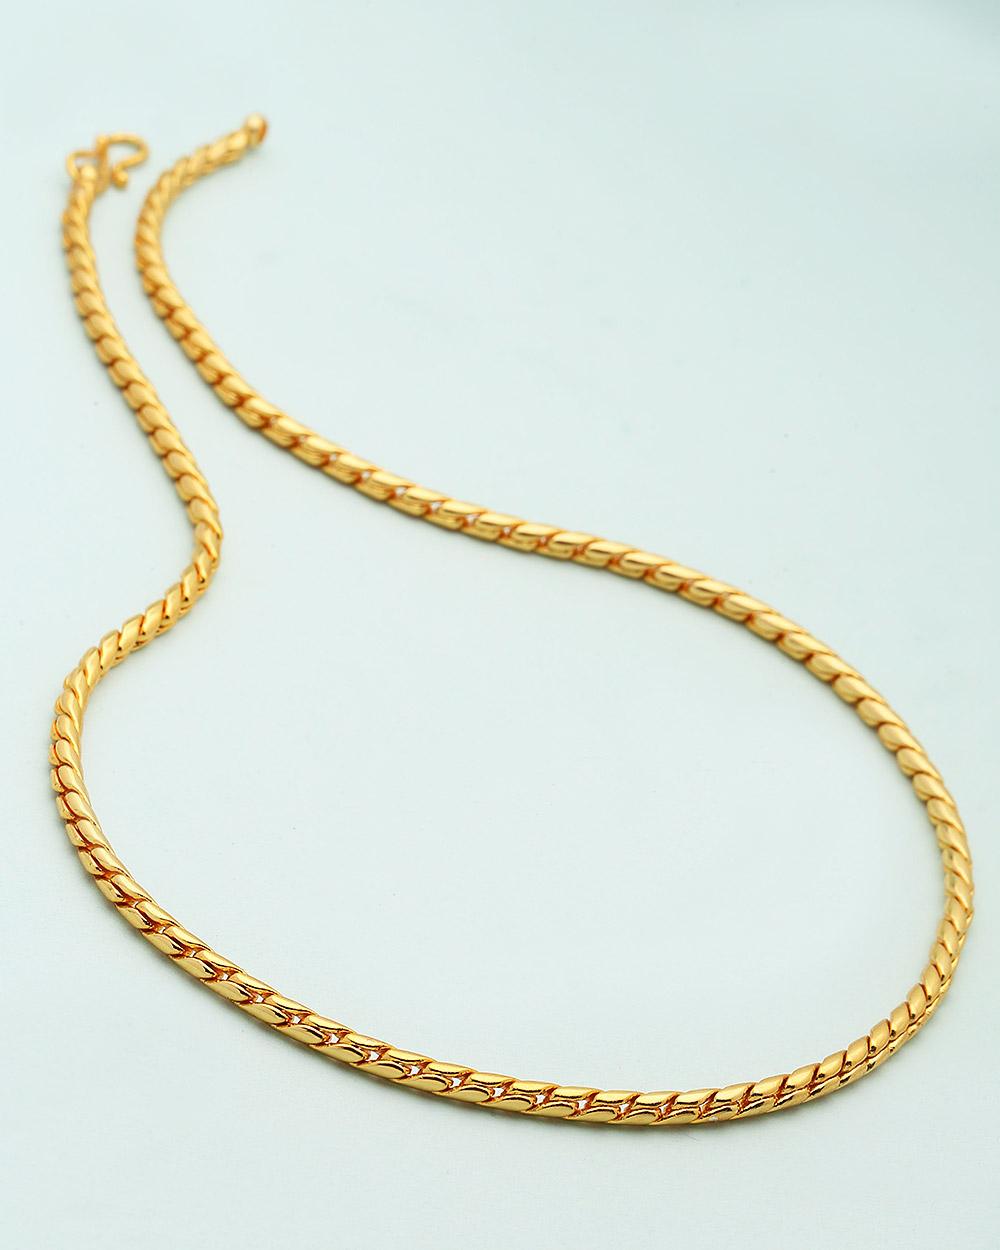 Buy Men\'s Yellow Gold Chain In Snake Pattern Online India   Voylla